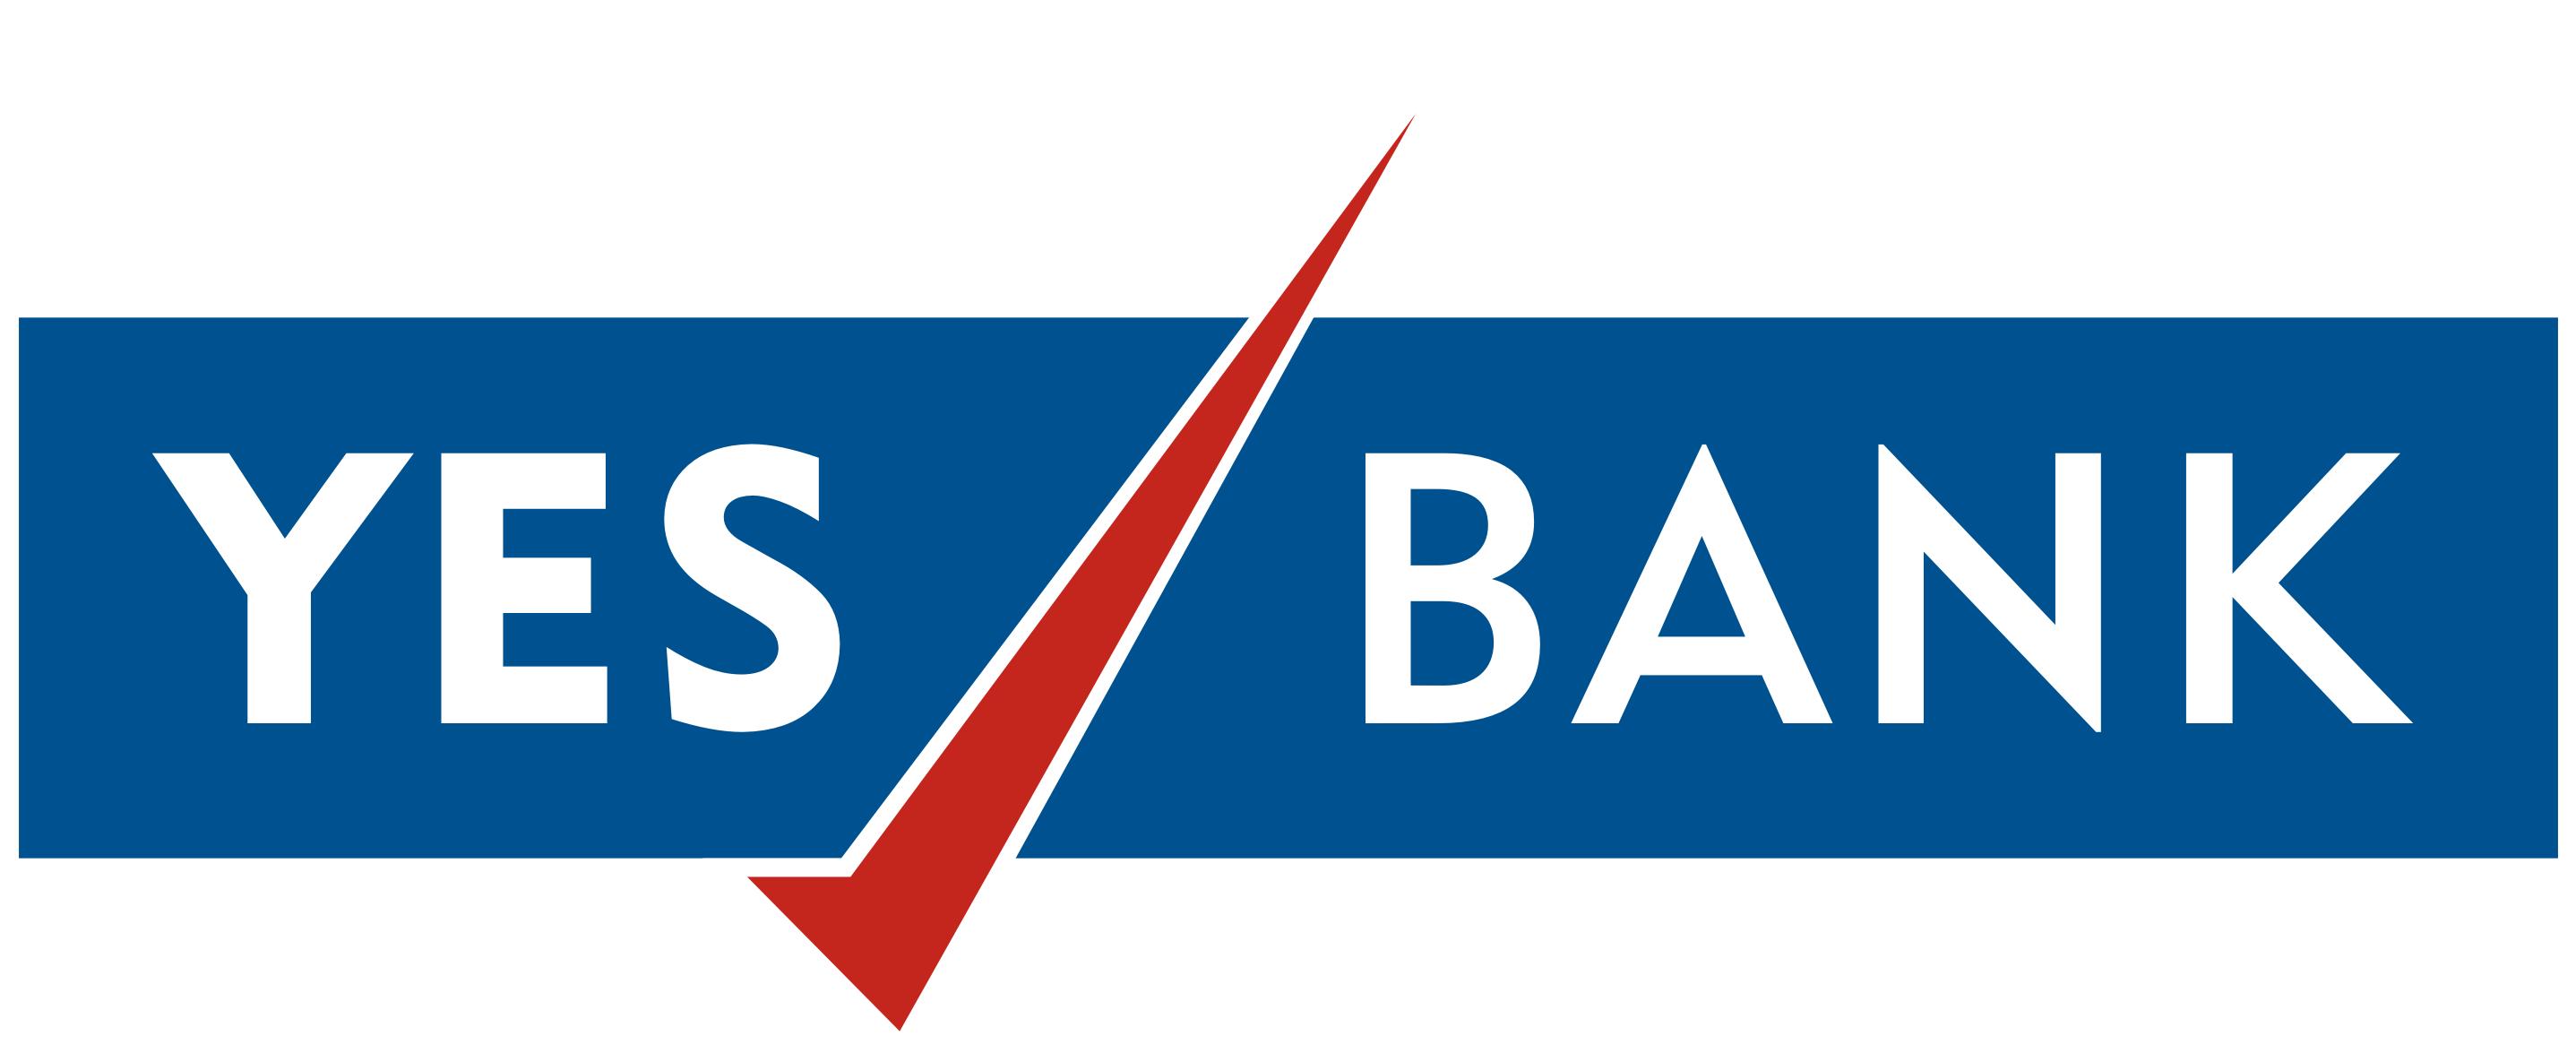 BANCORO Logo photo - 1